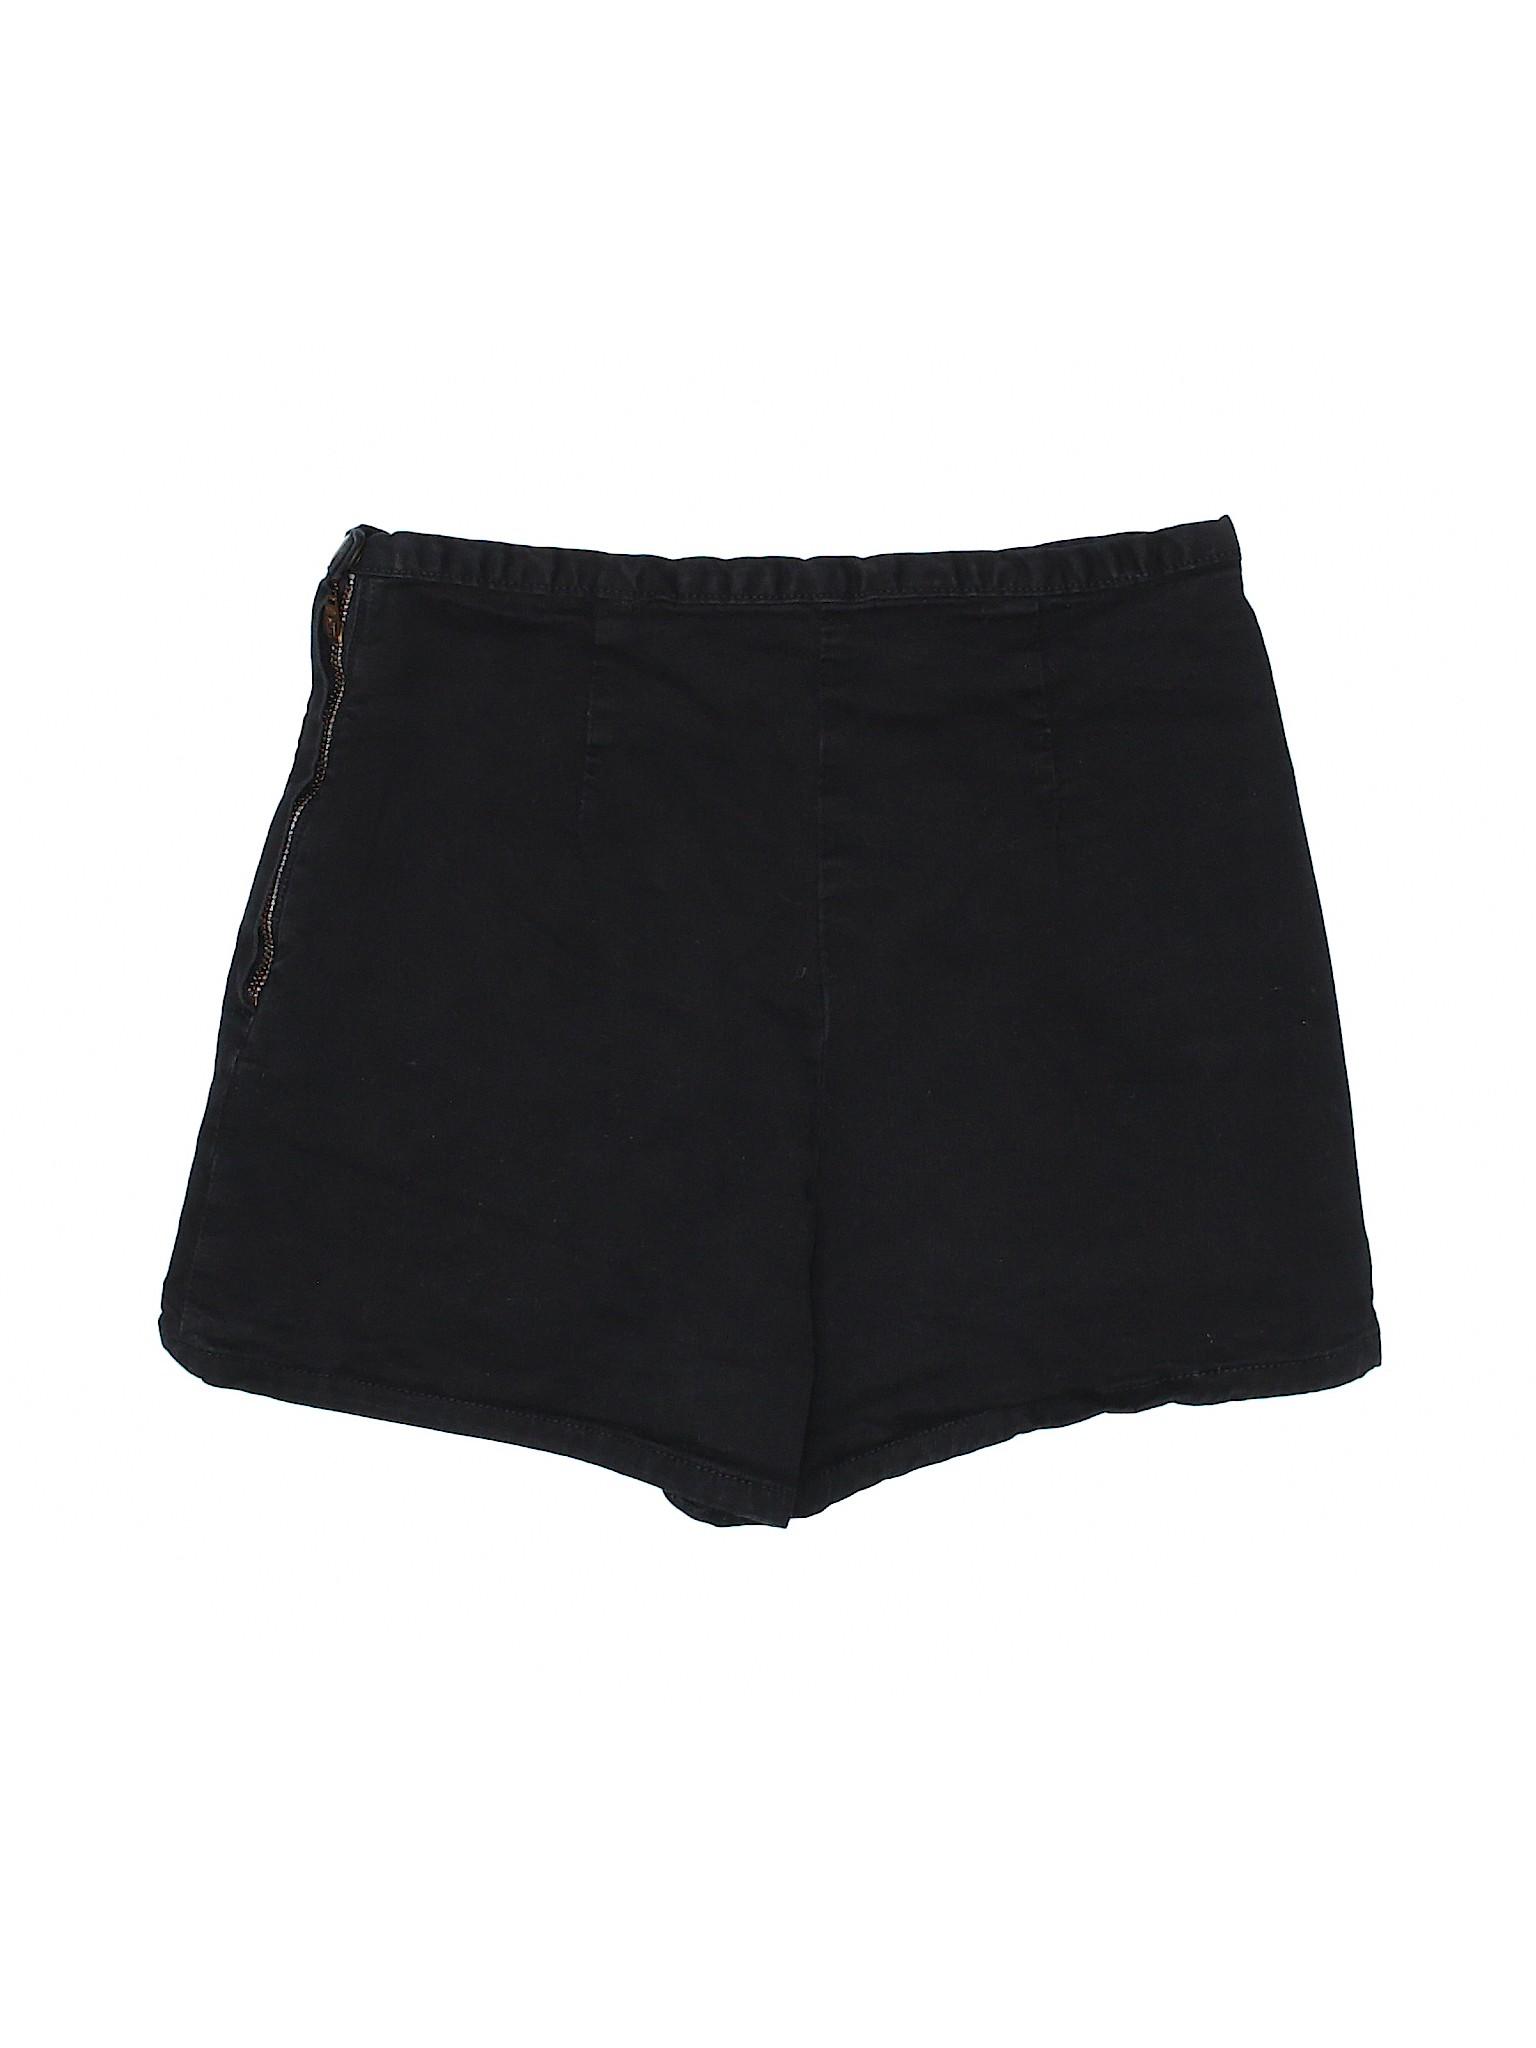 Boutique Shorts American Denim Boutique Apparel American wgxSaYgr